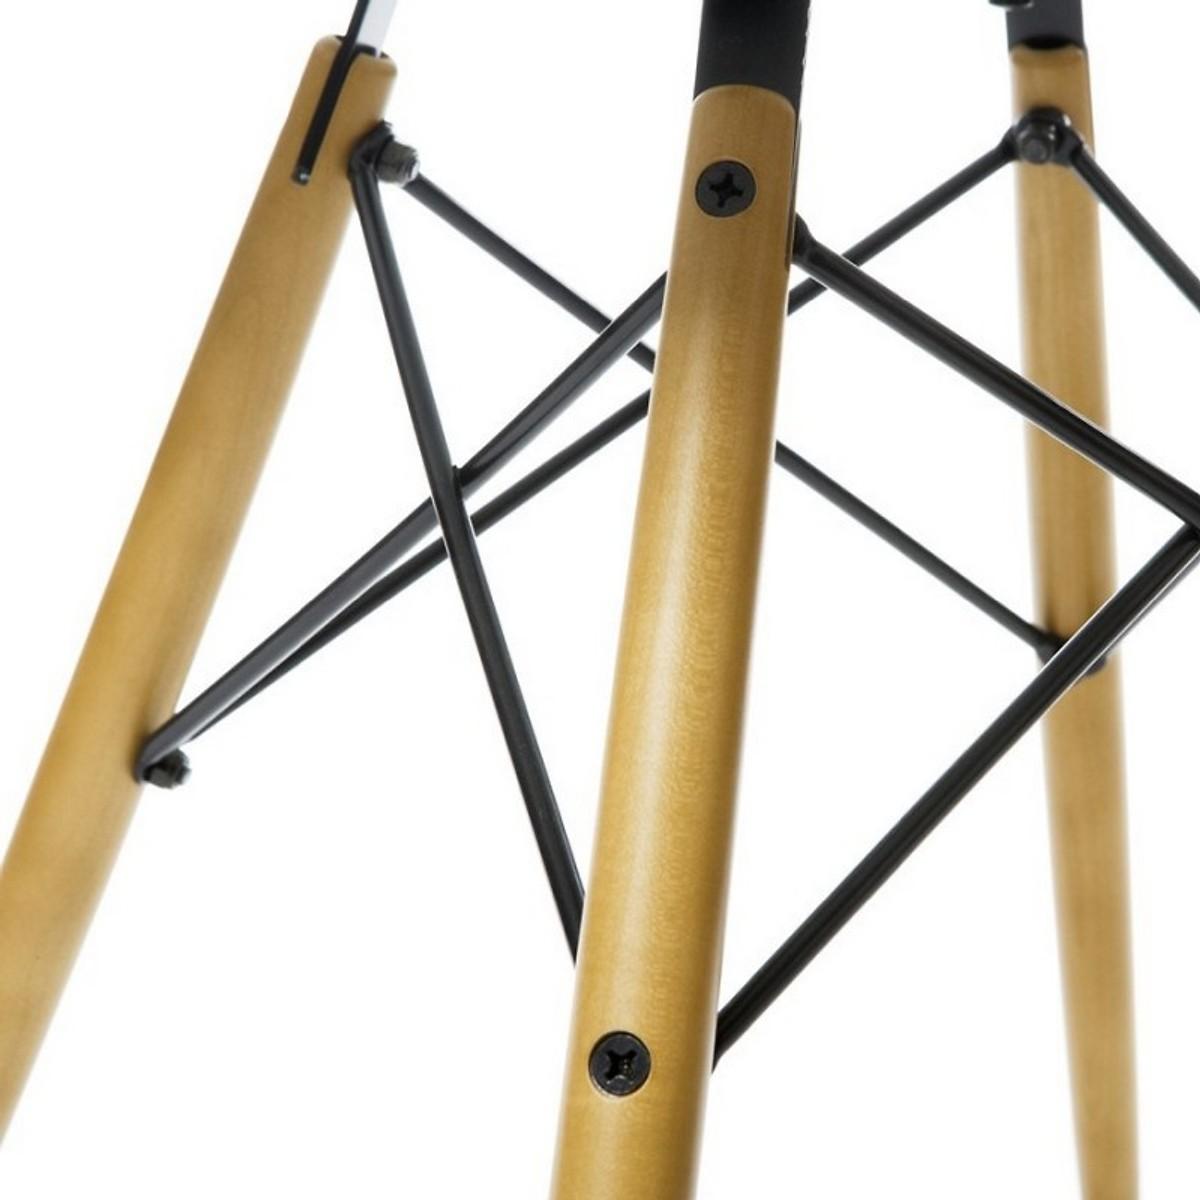 Ghế nhựa chân gỗ E4